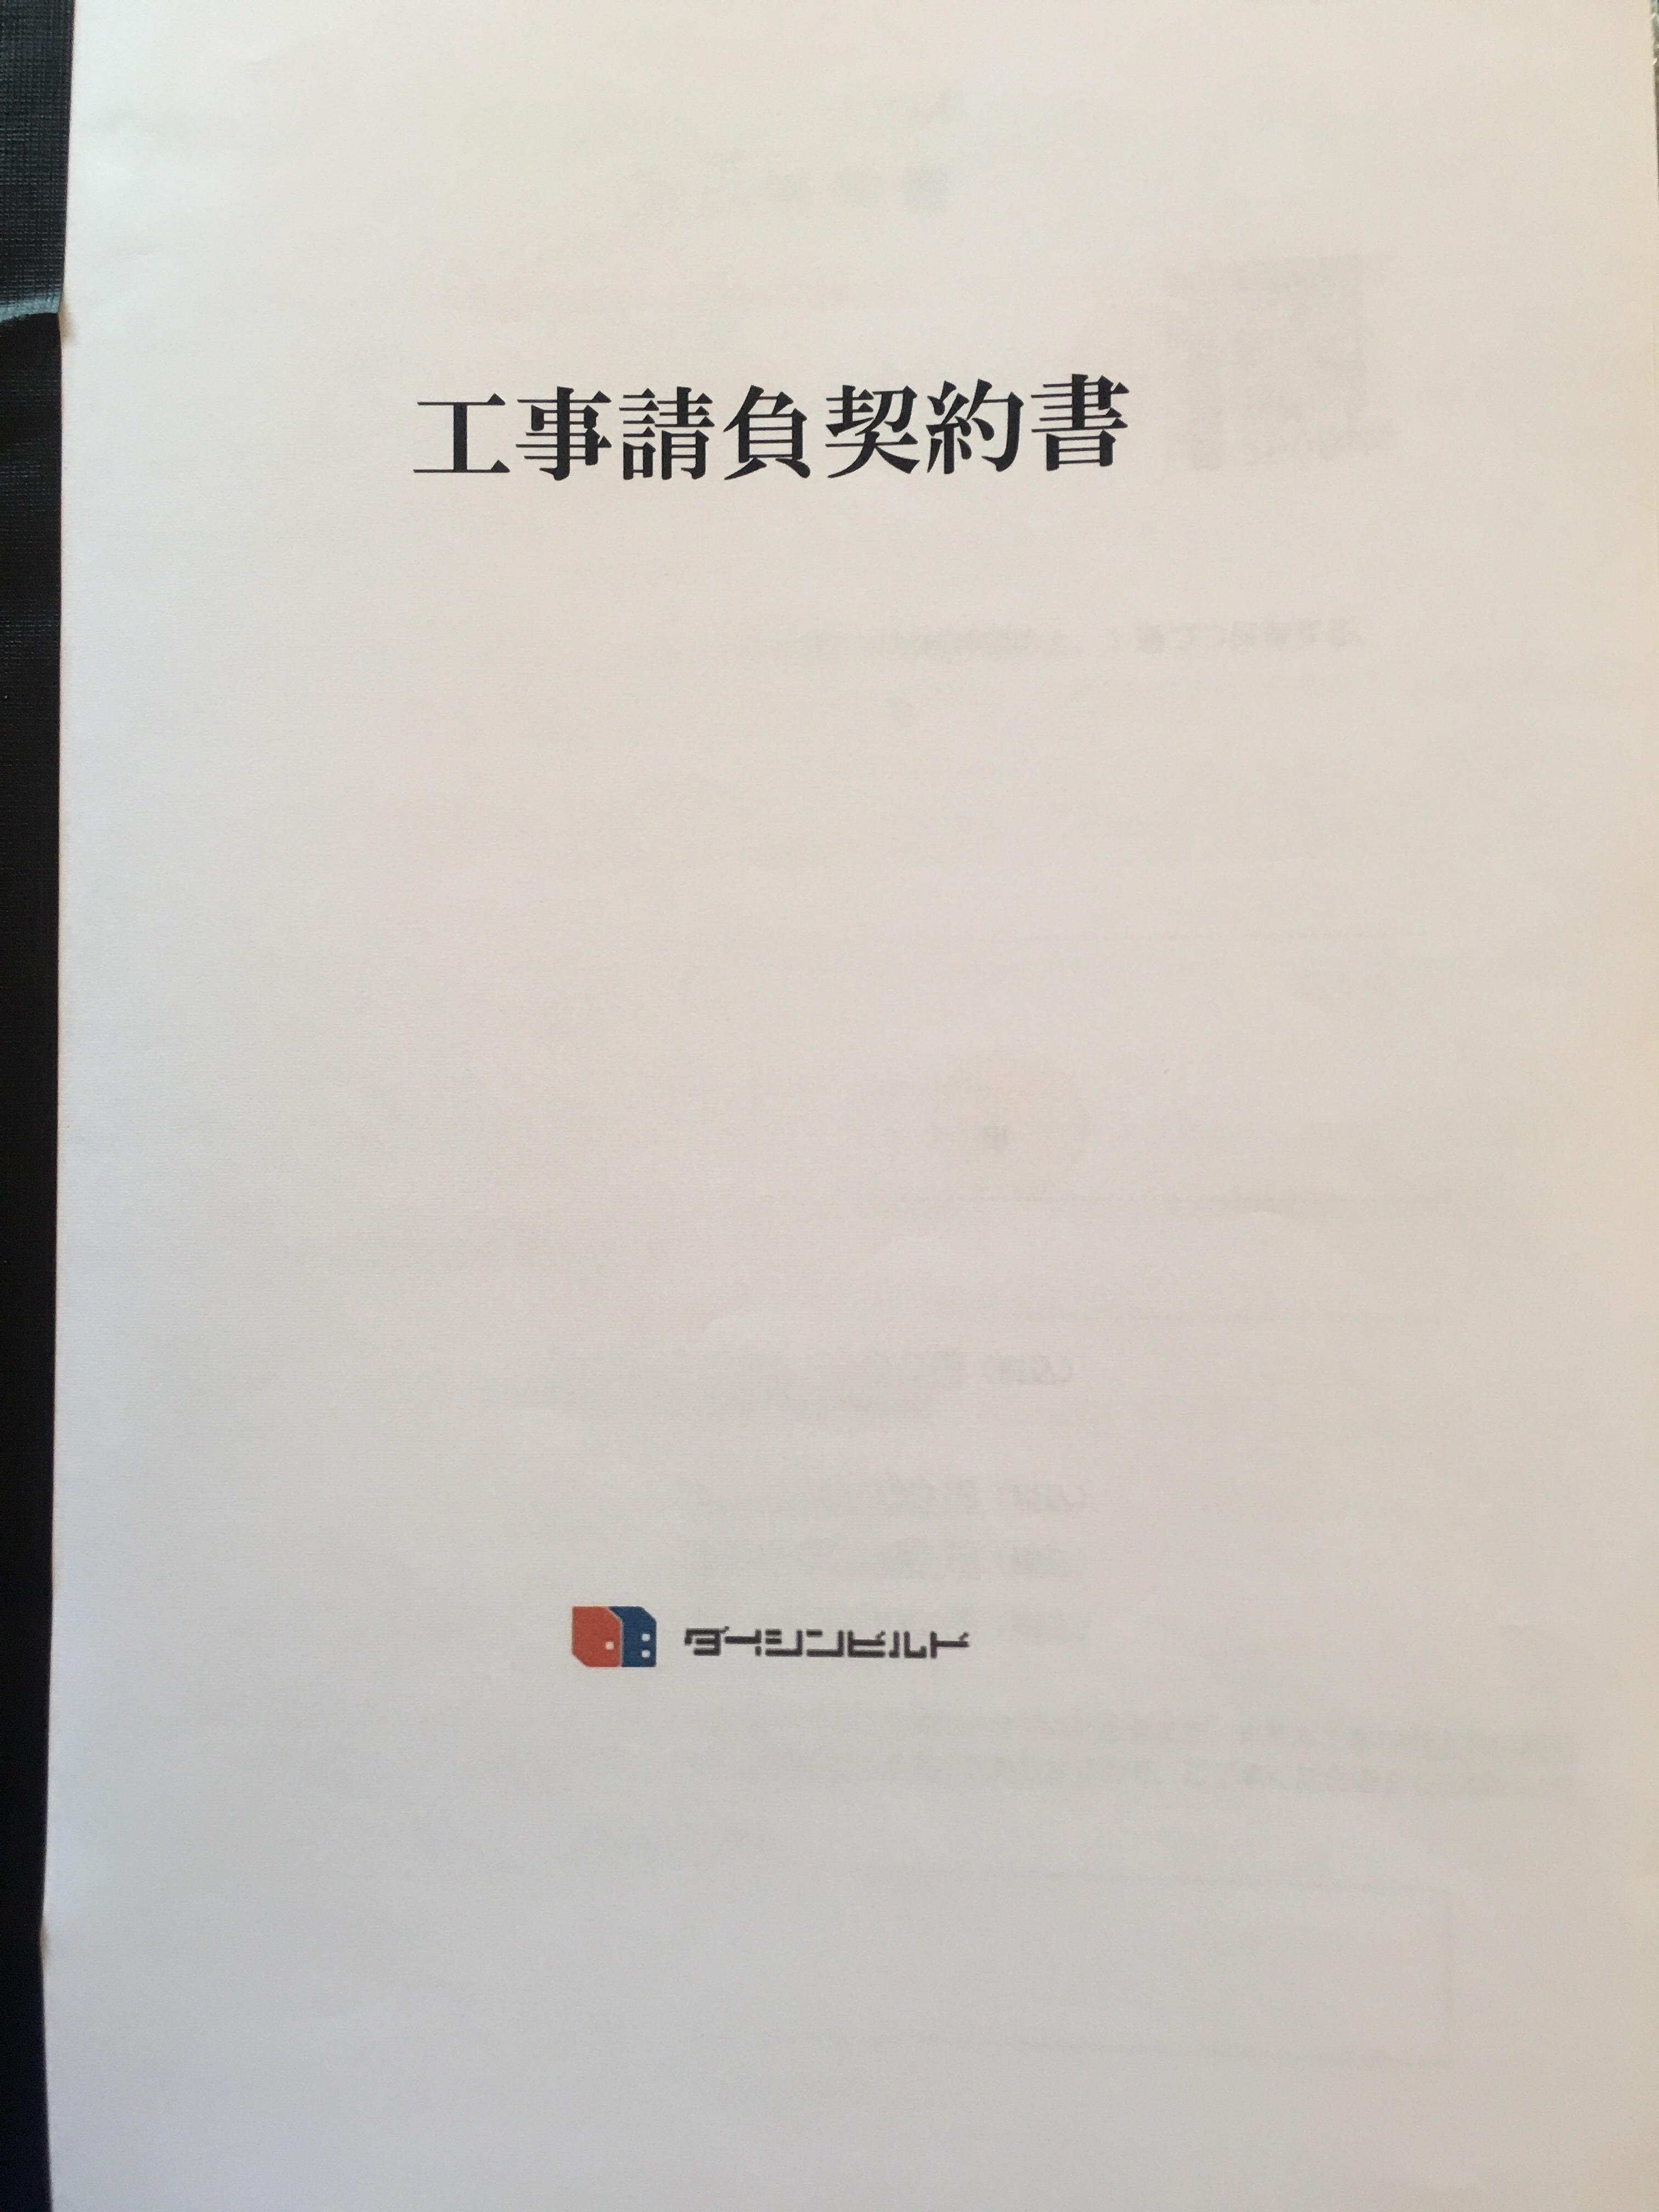 工事契約書の画像